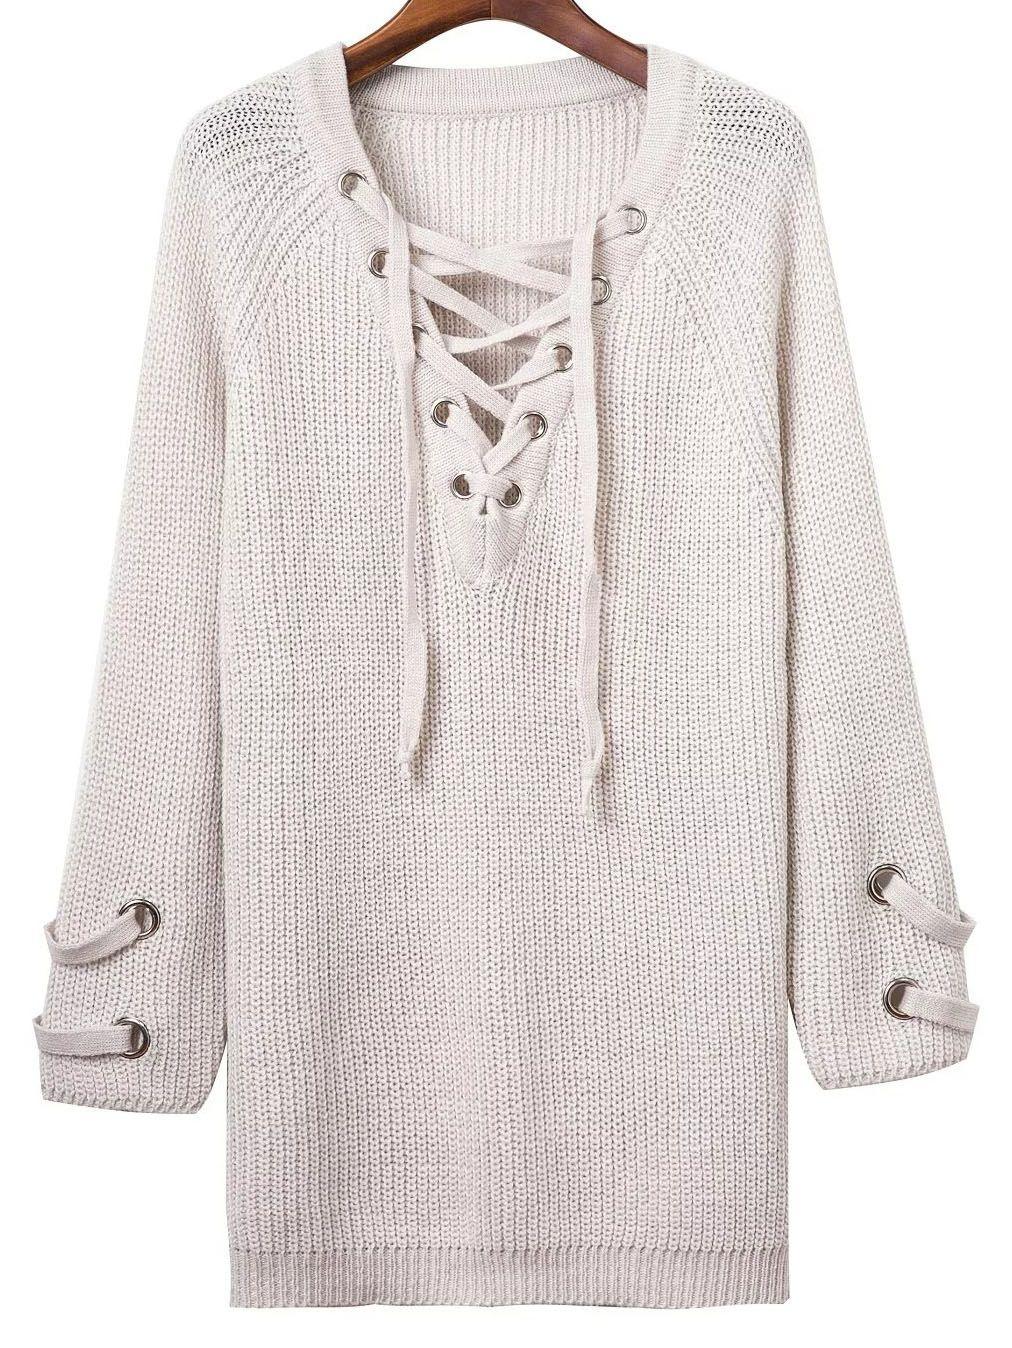 ee7573fe Vestido de punto manga larga escote V cordón-(Sheinside) | Vestidos ...